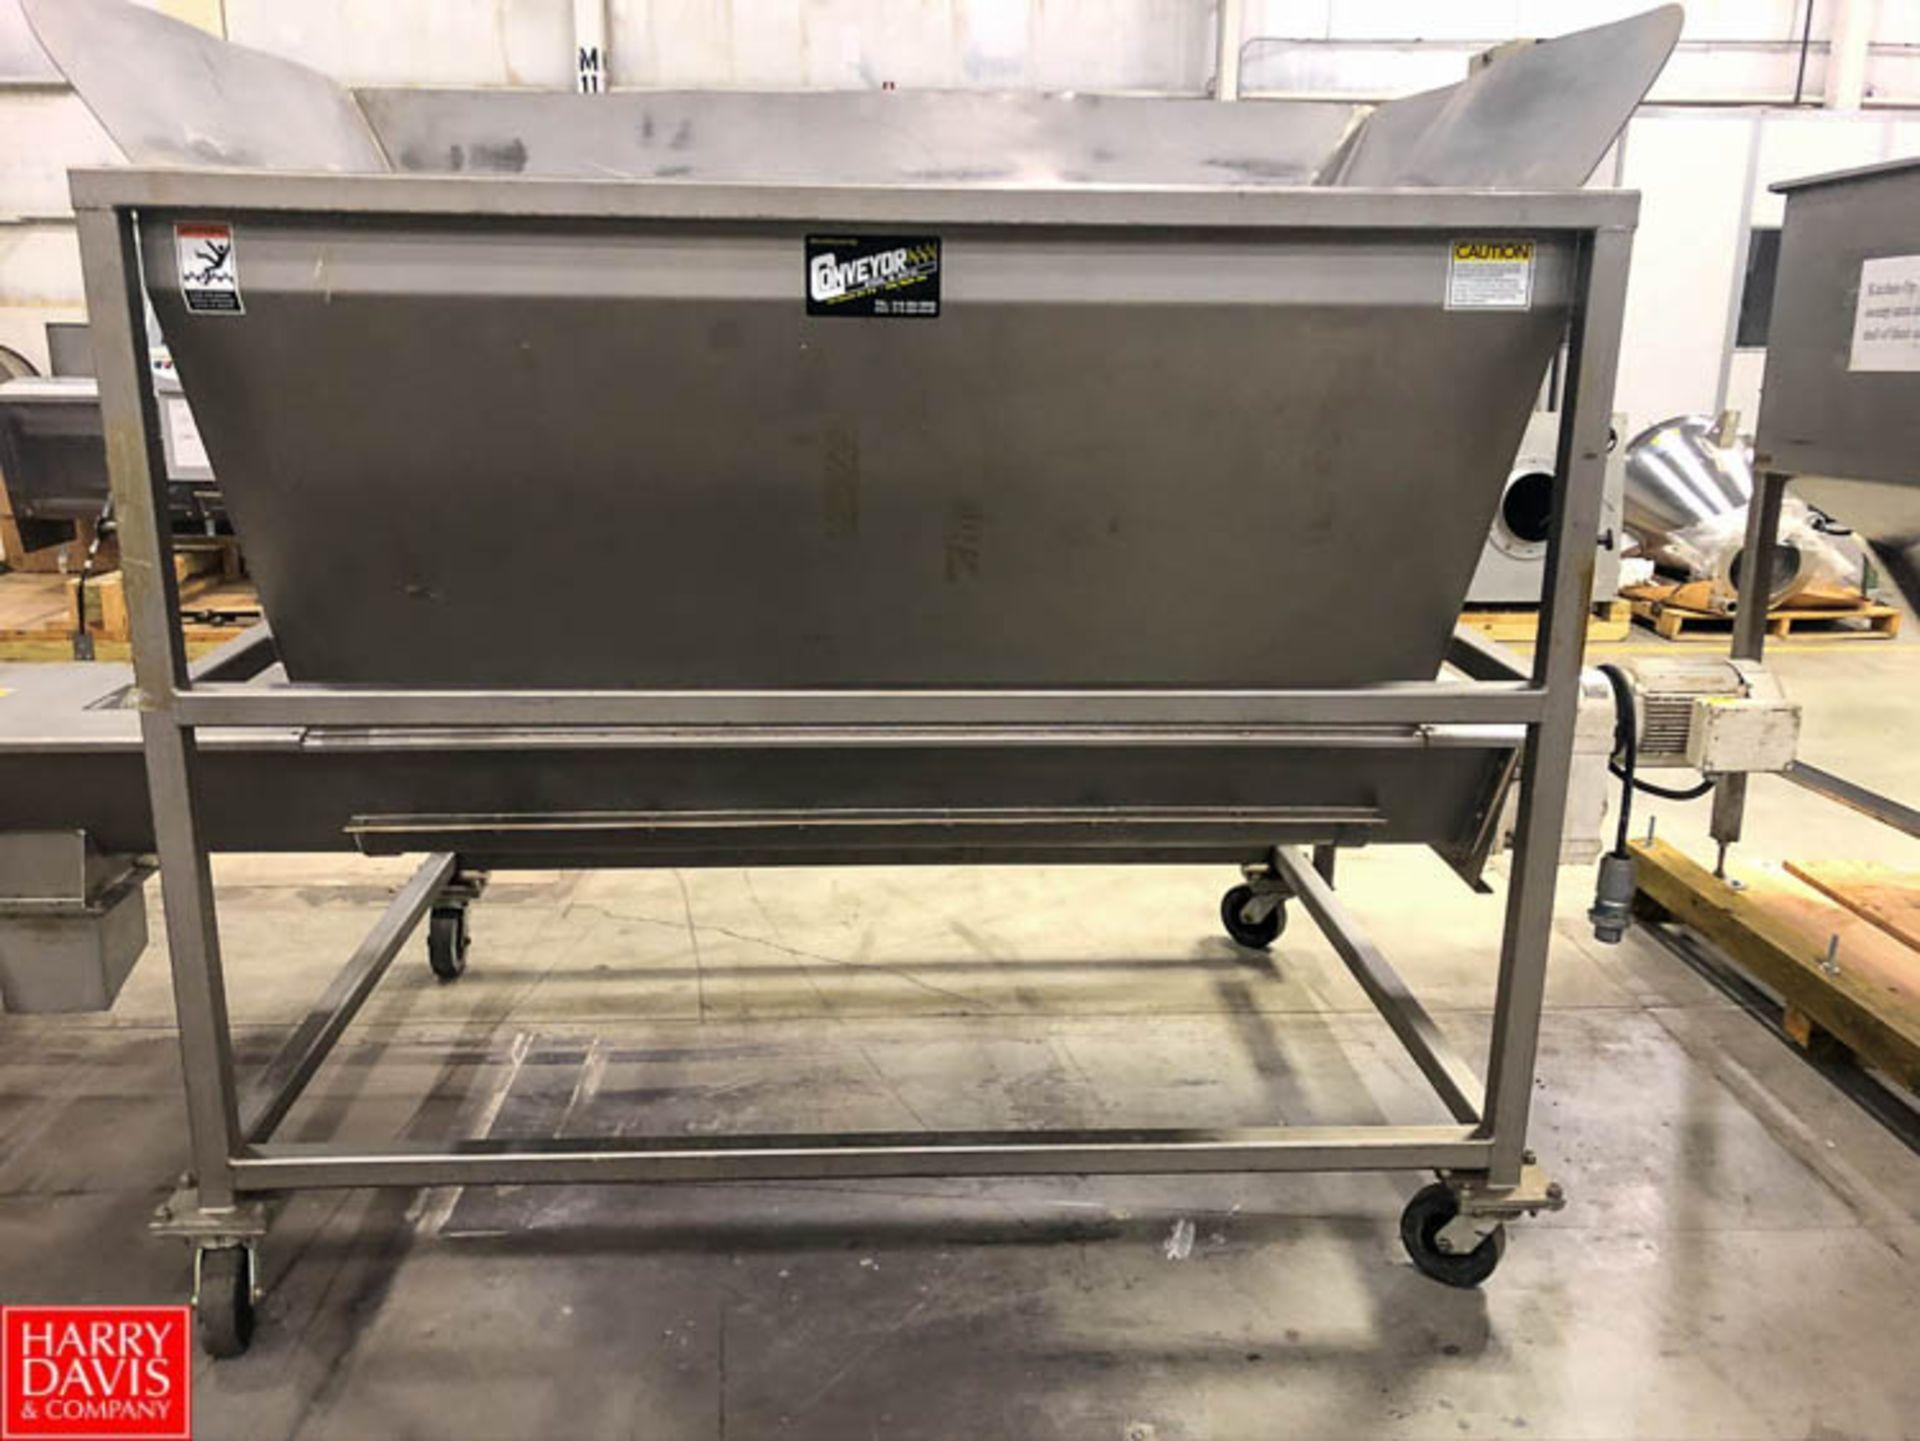 Conveyor Engineering Hopper with Auger Conveyor, 6' x 4.5' Rigging Fee: $75